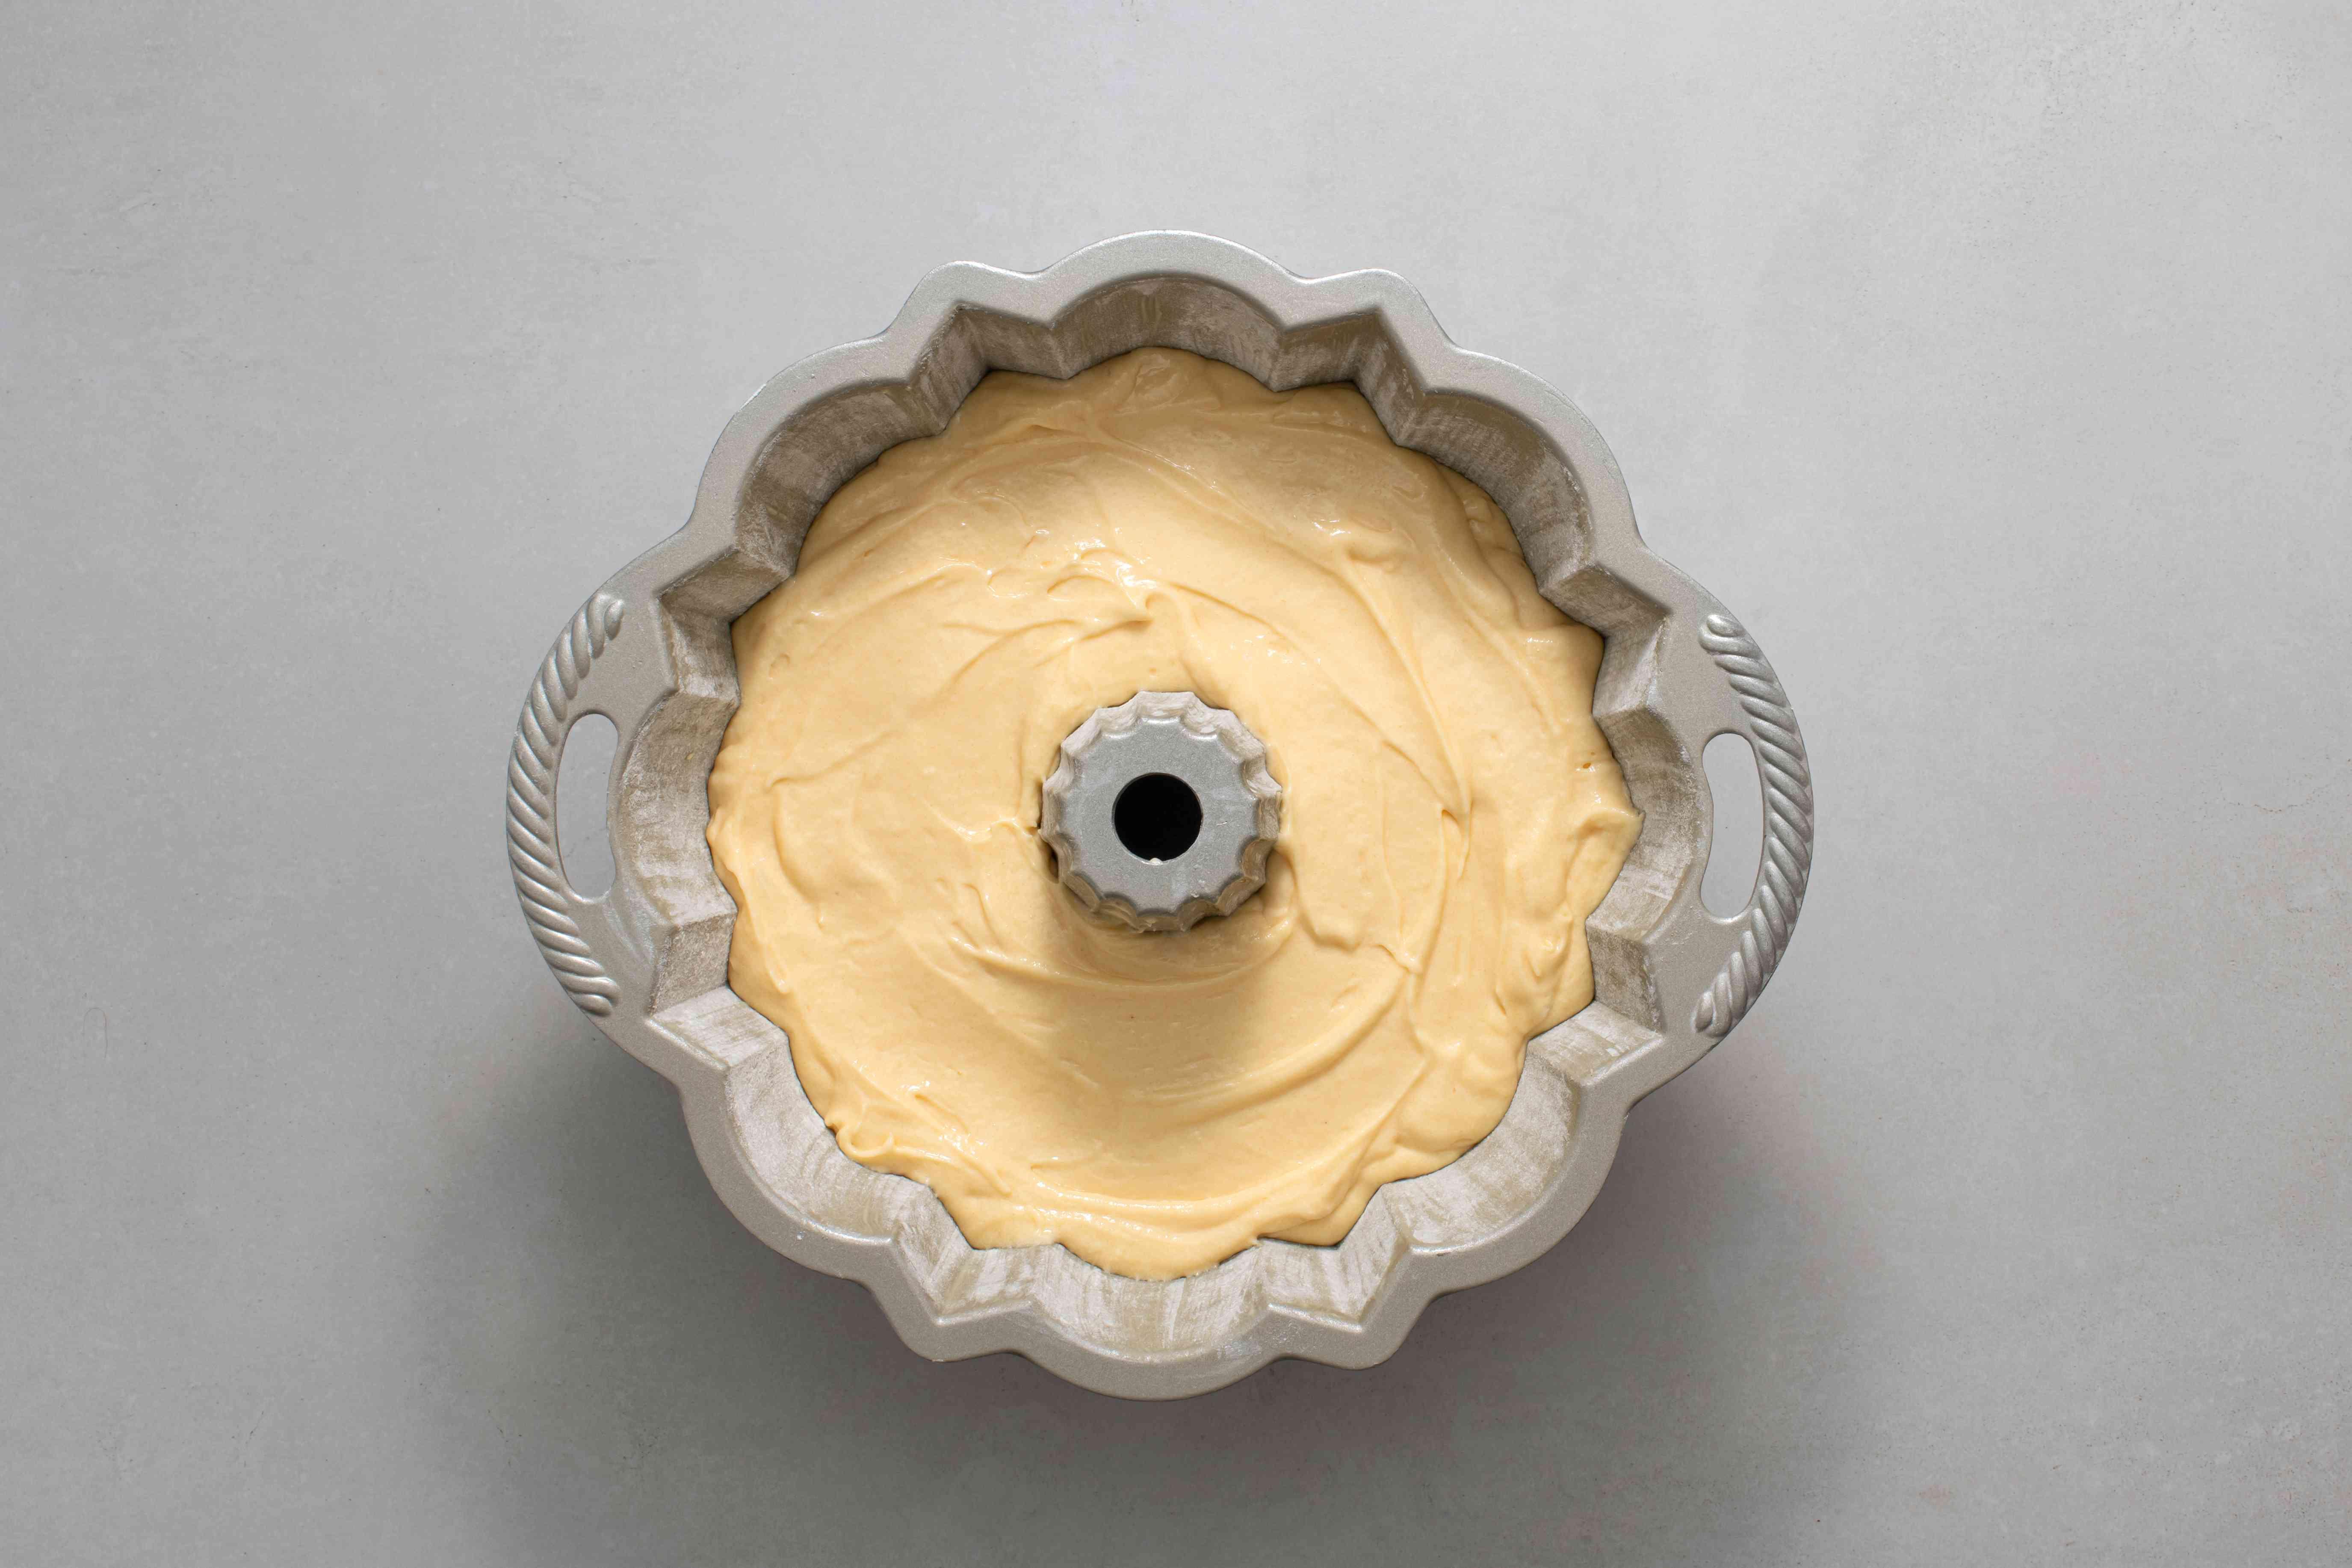 batter in a cake pan